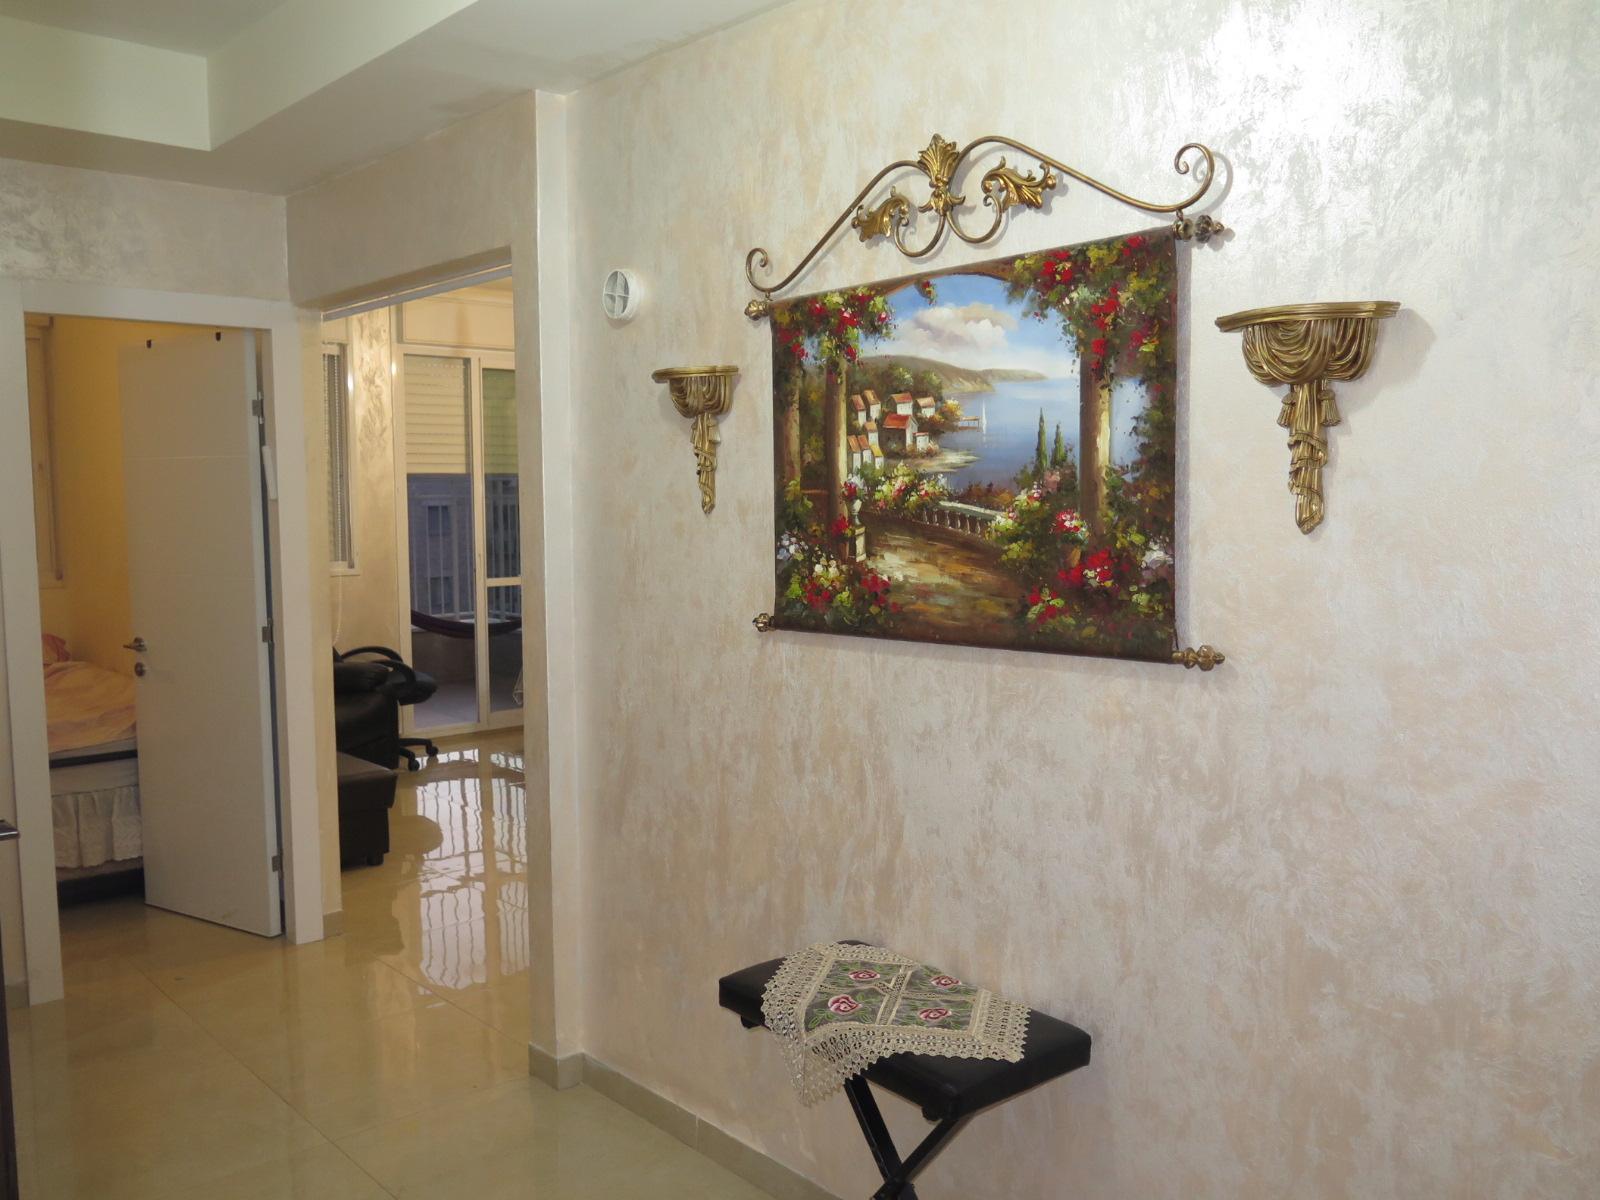 3 Bedroom Vacation Rental in Gush 80 Jerusalem